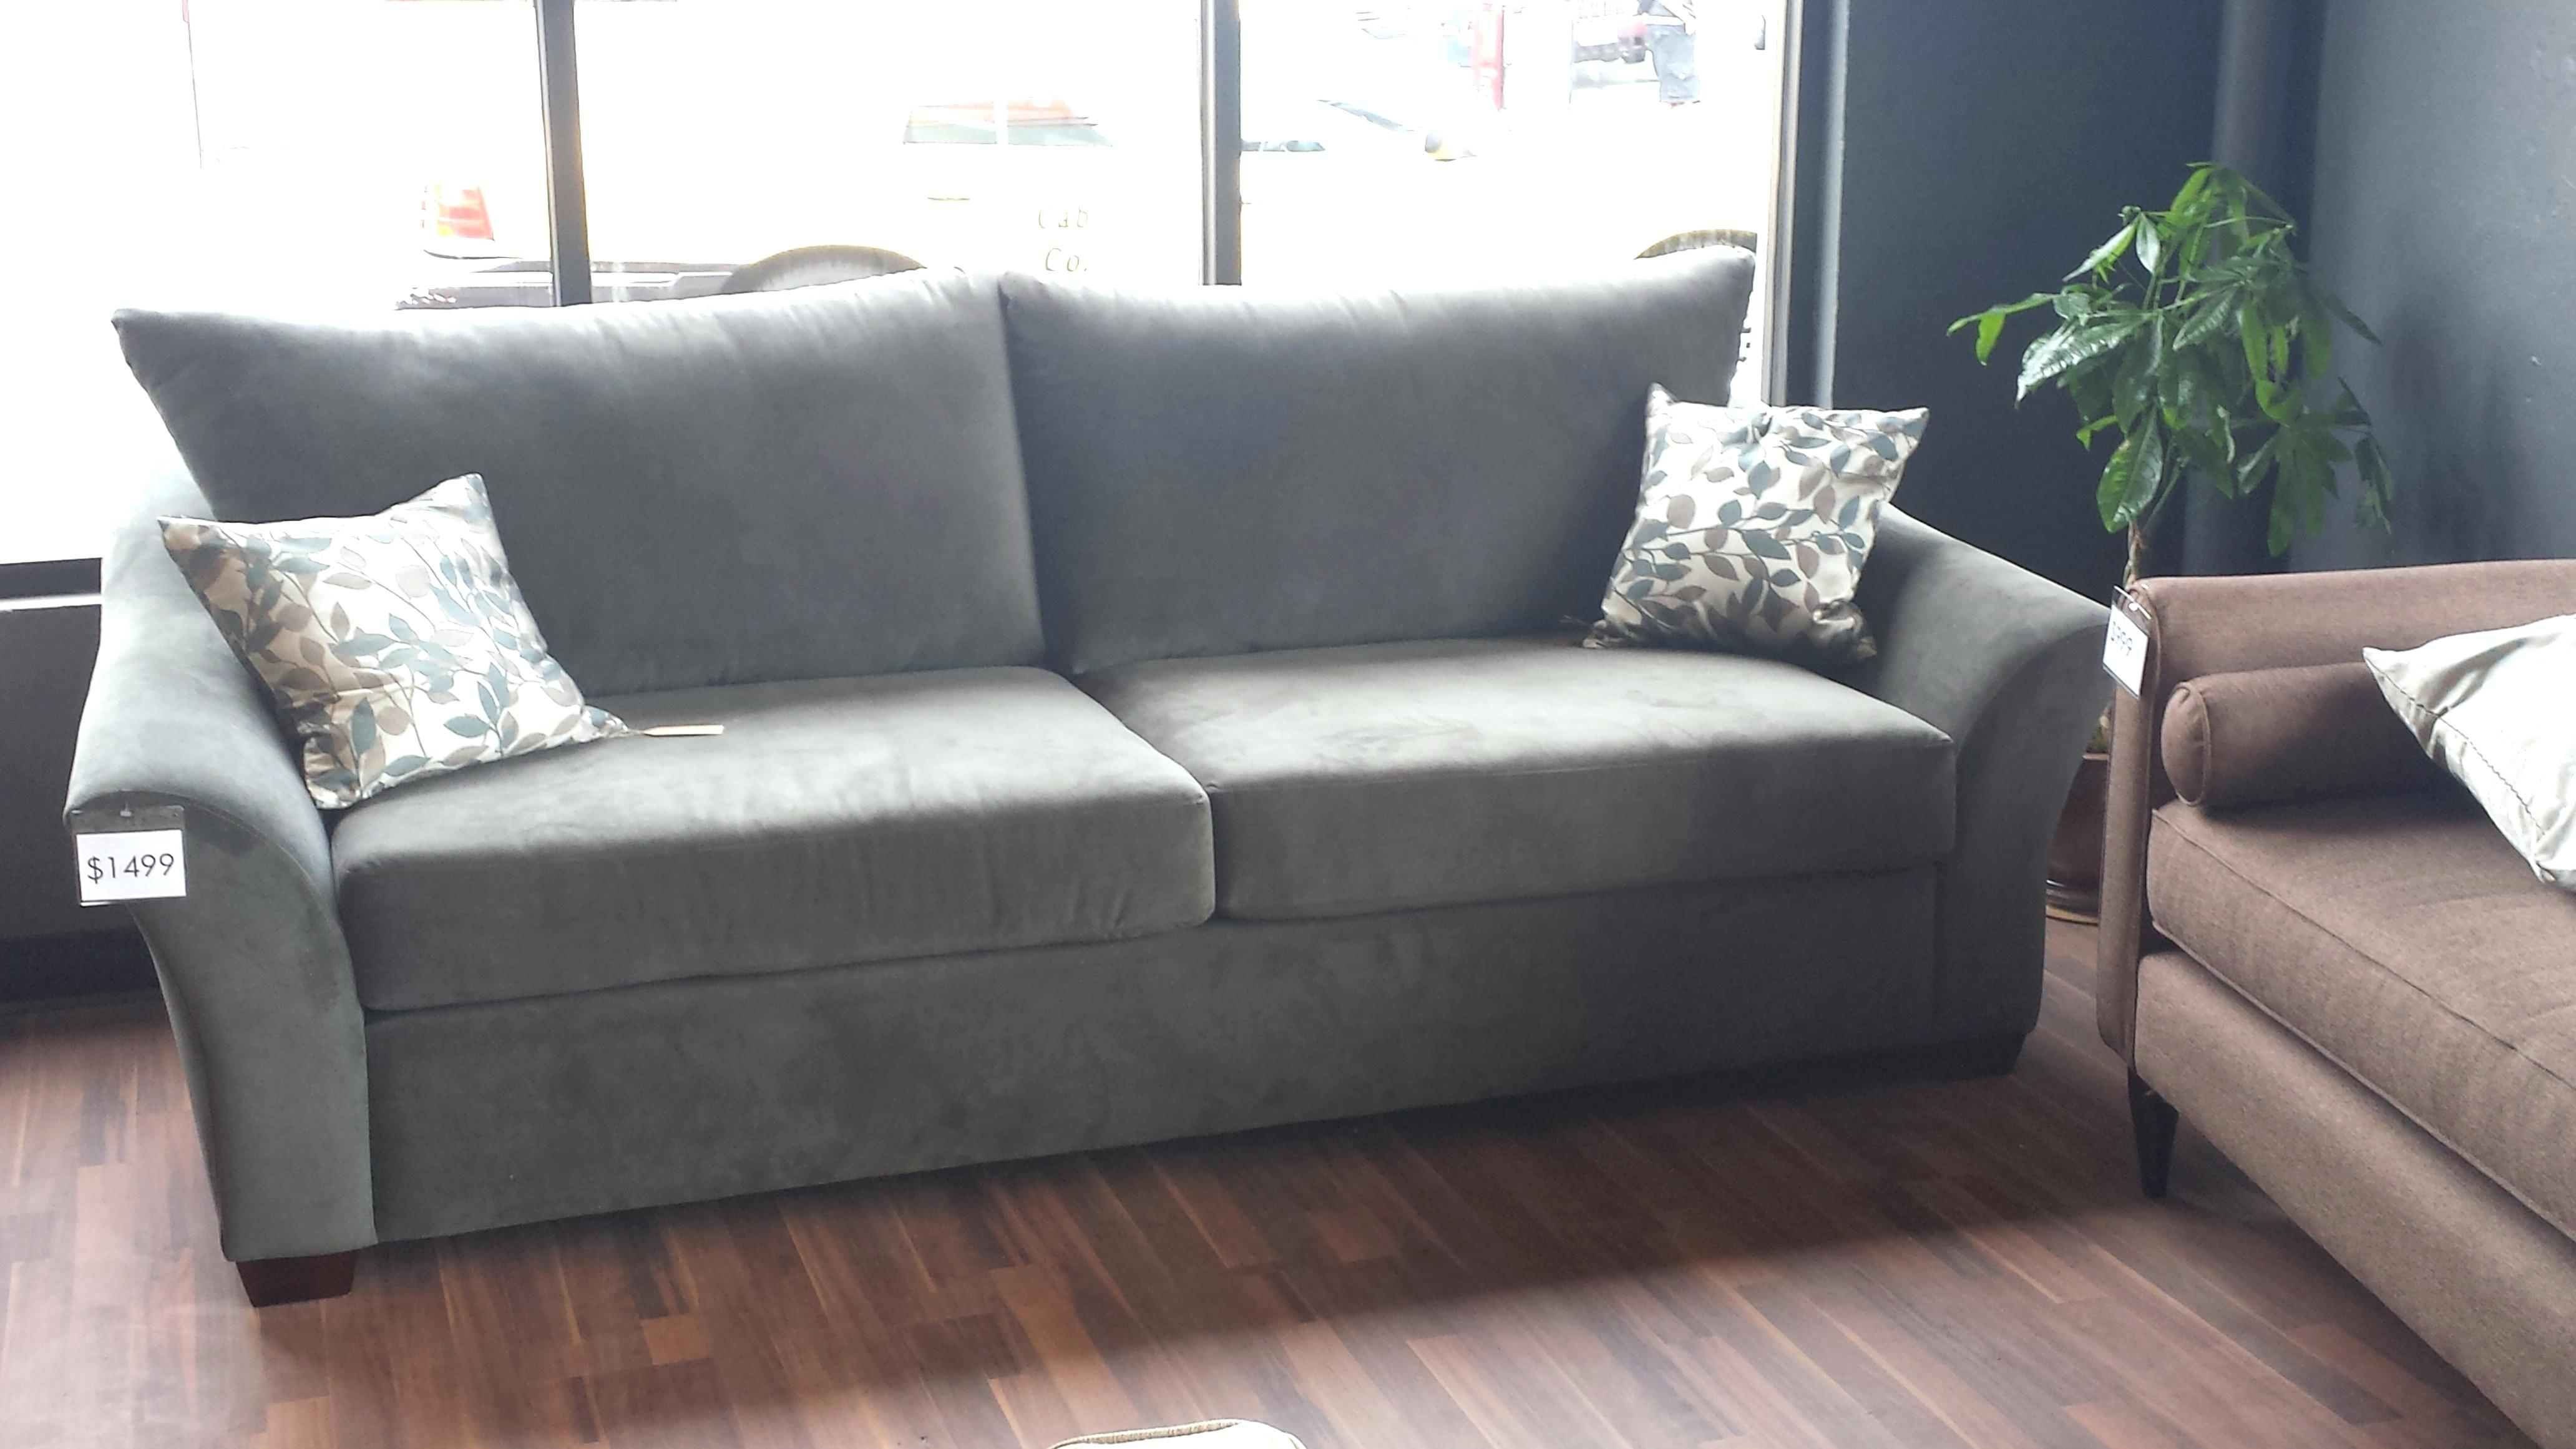 Deep Sectional Couch Sas Sa Sofas For Sale Sofa Canada Cushion For Deep Cushion Sofas (Image 6 of 10)